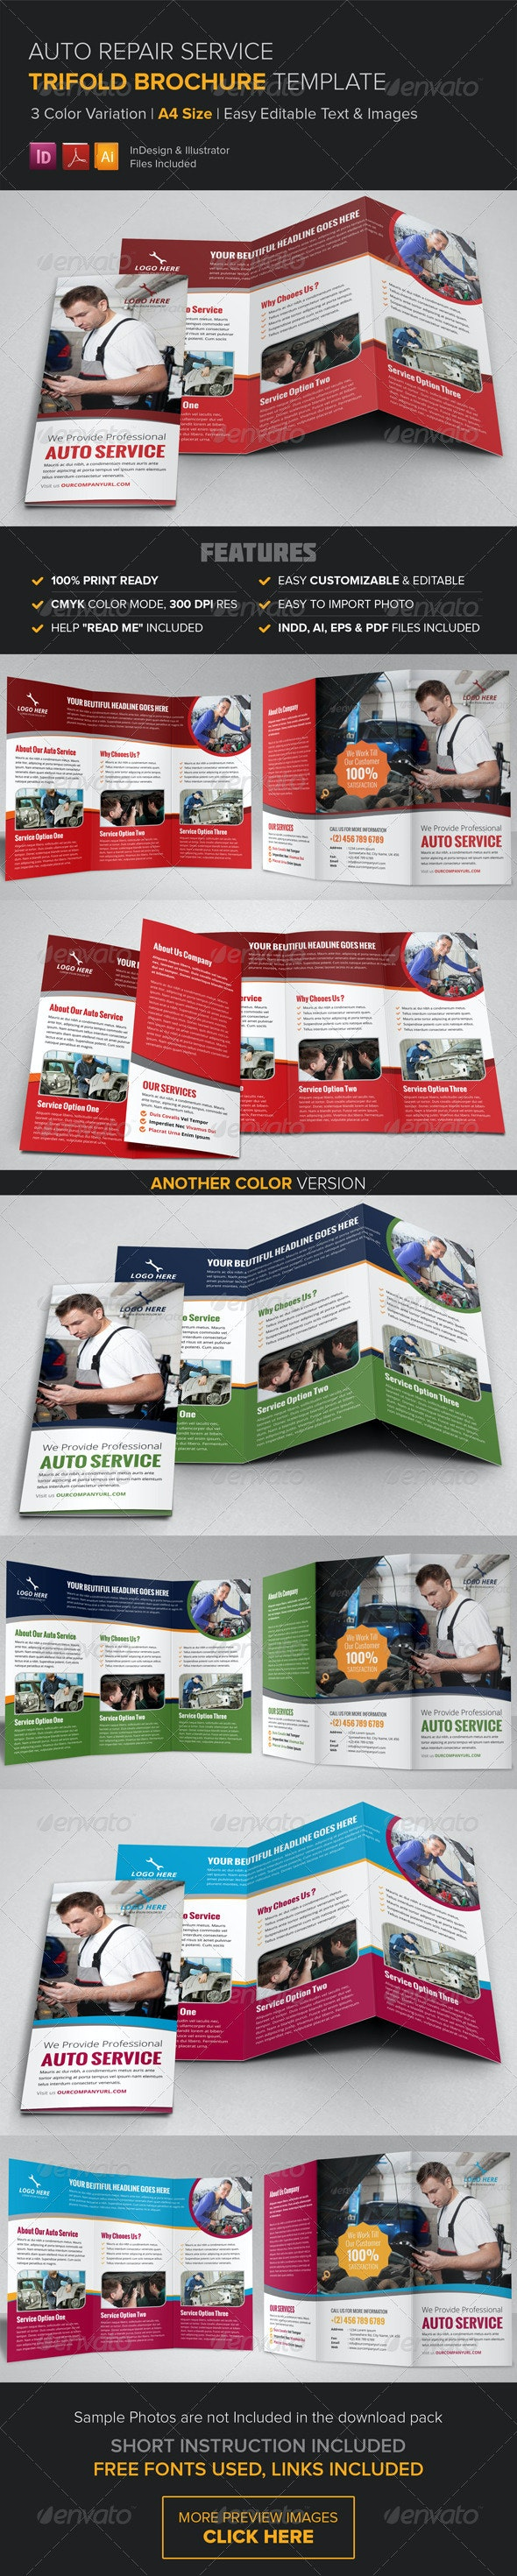 Auto Repair Service Trifold Brochure Template  - Corporate Brochures